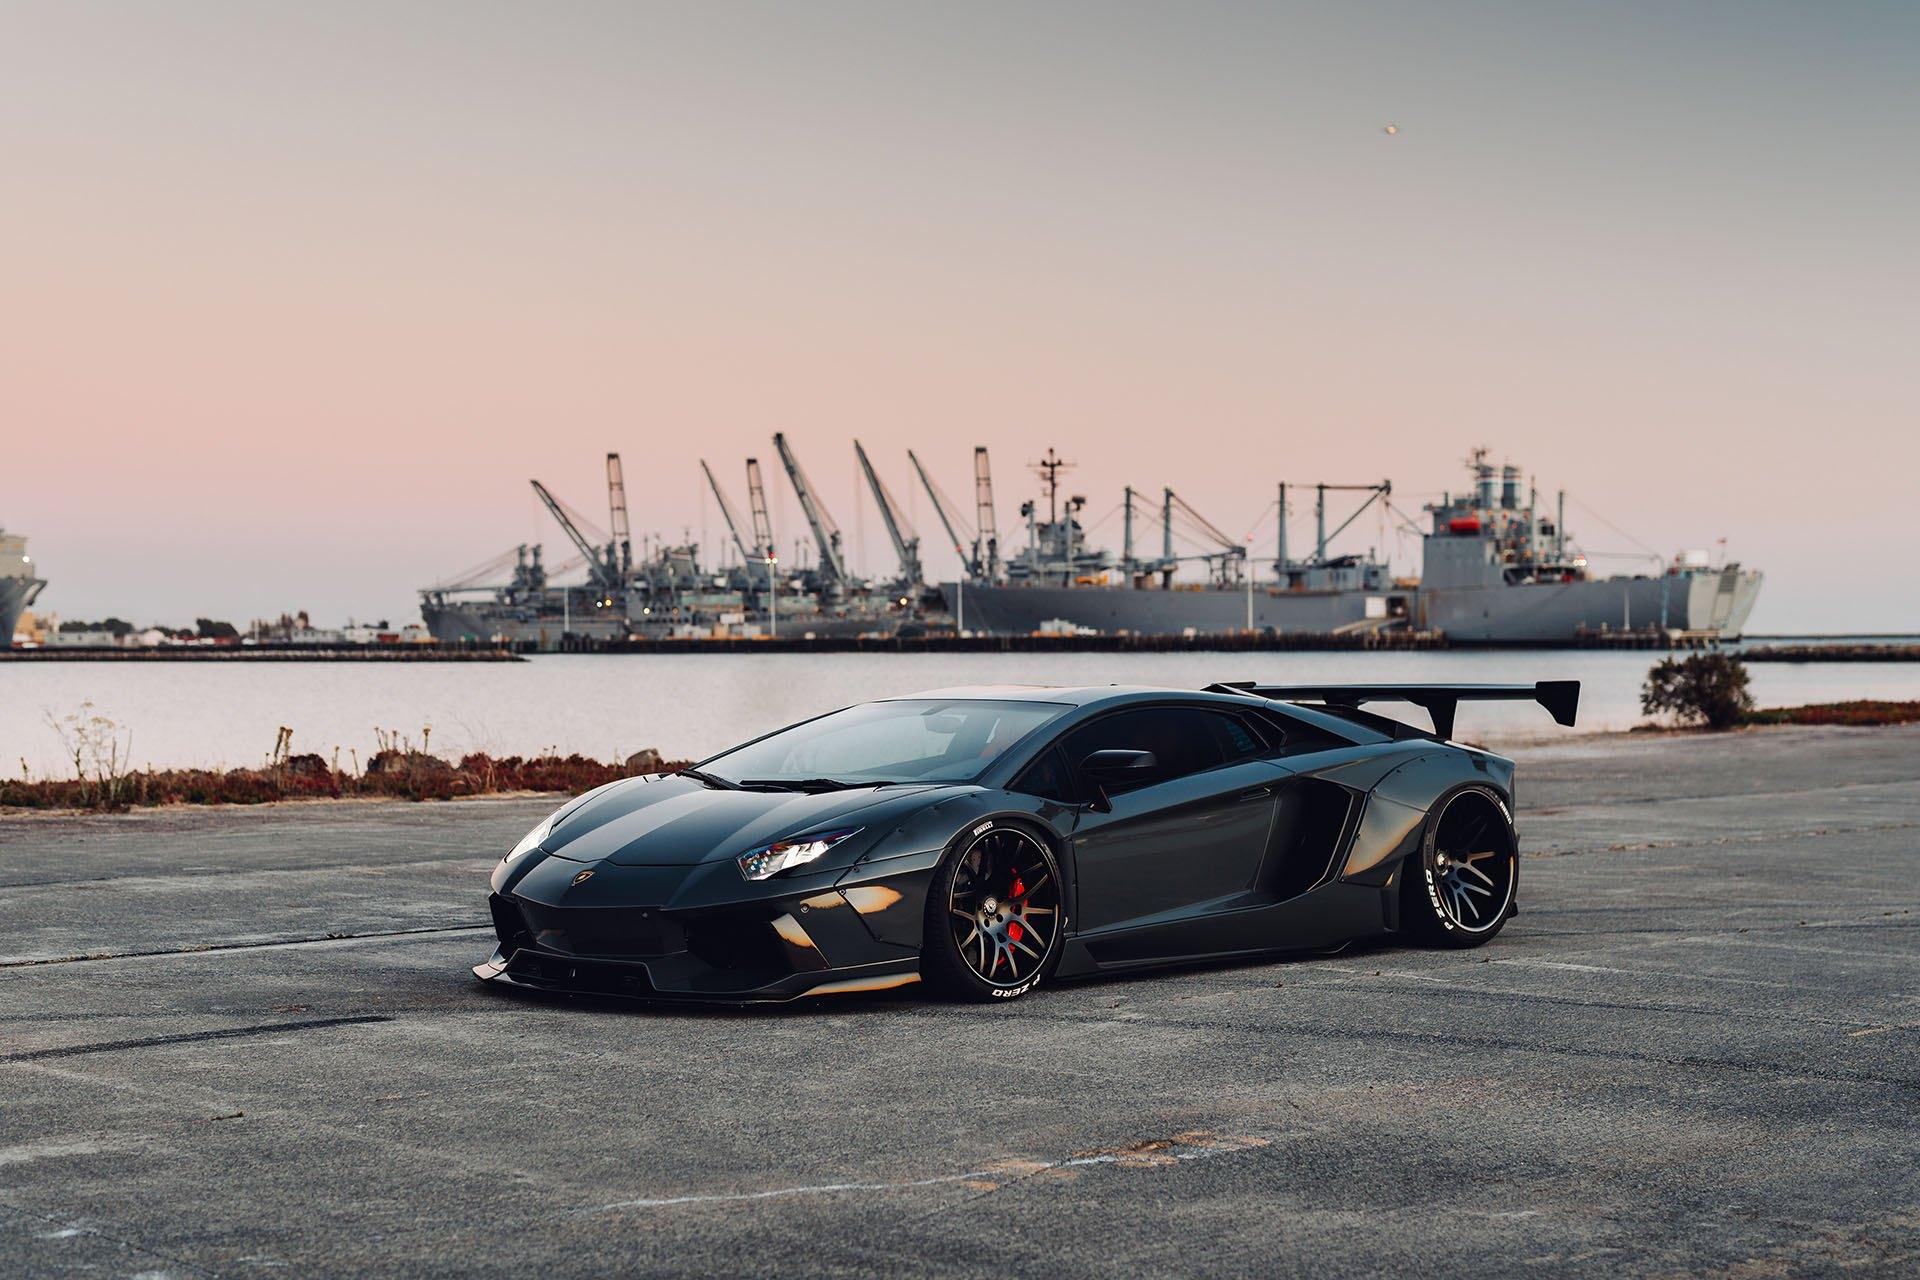 Custom 2019 Lamborghini Aventador Images Mods Photos Upgrades